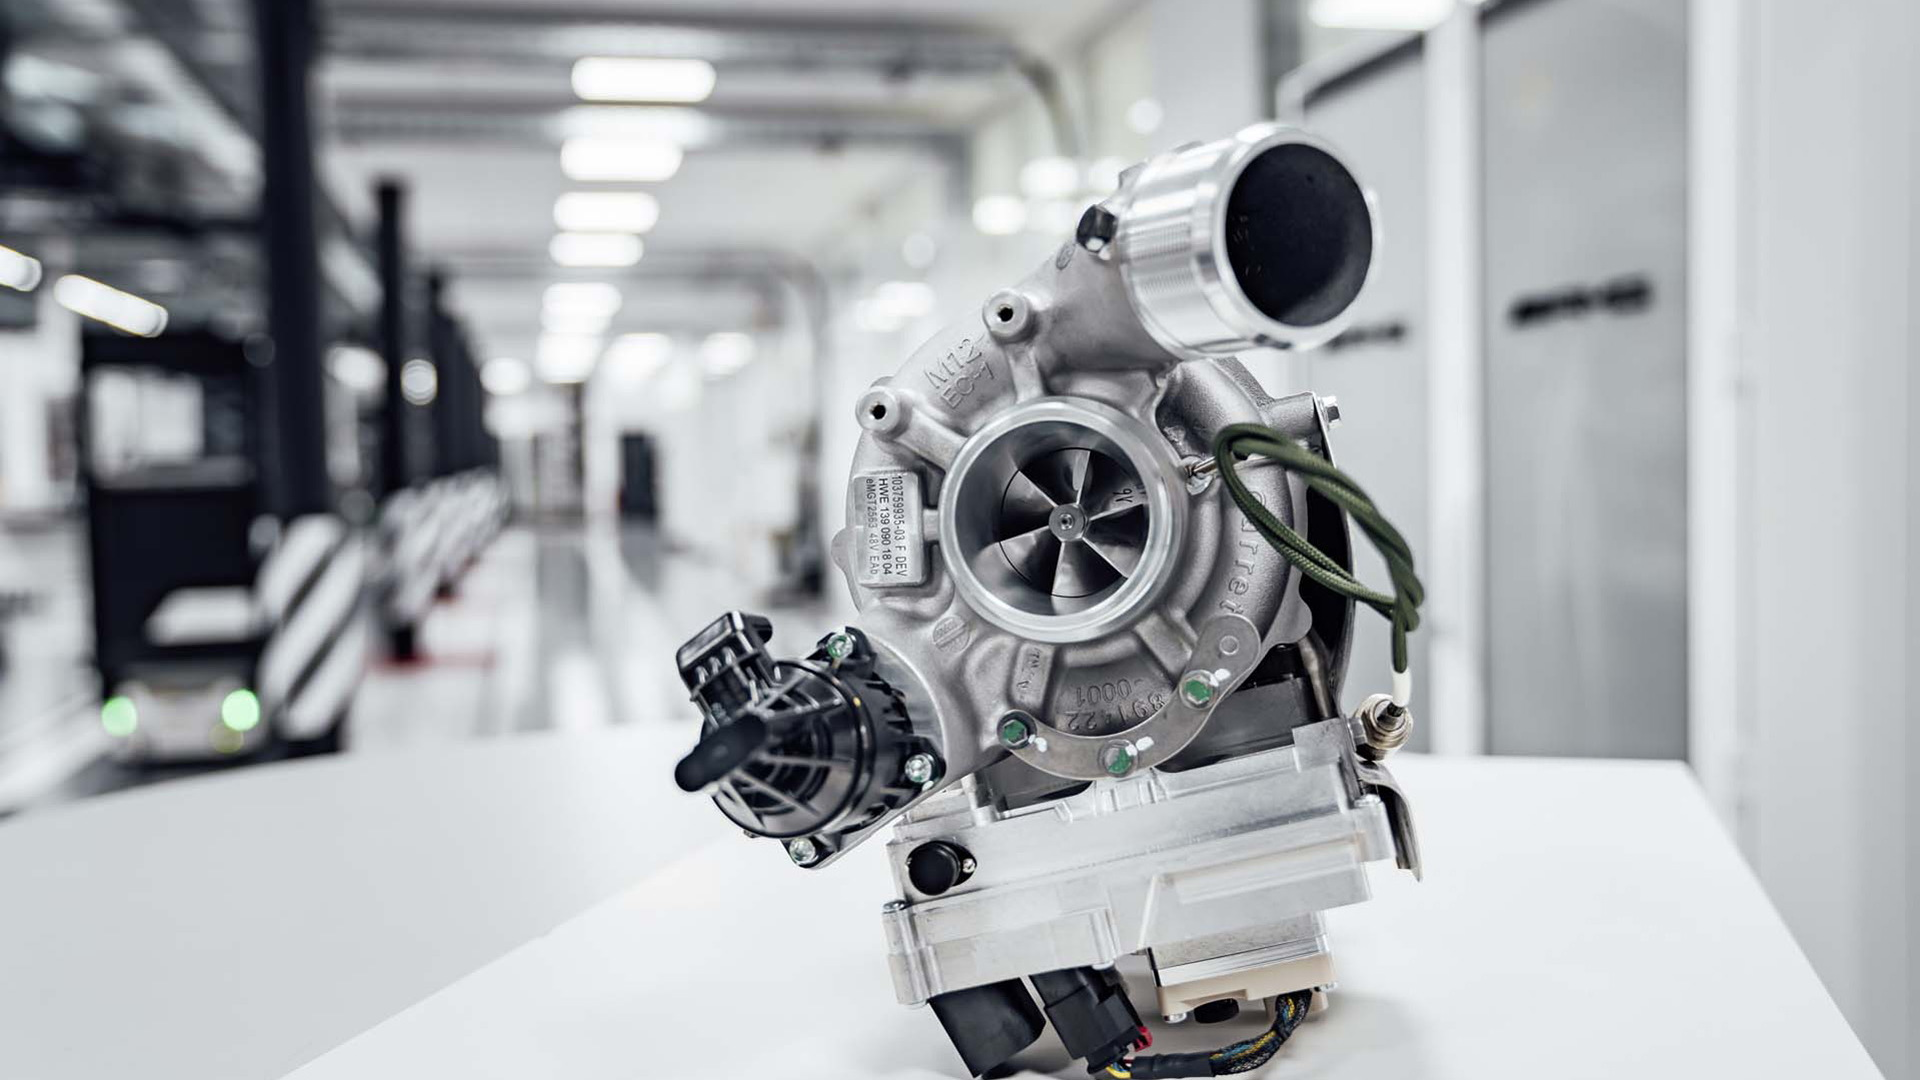 Garrett E-Turbo electrified turbocharger